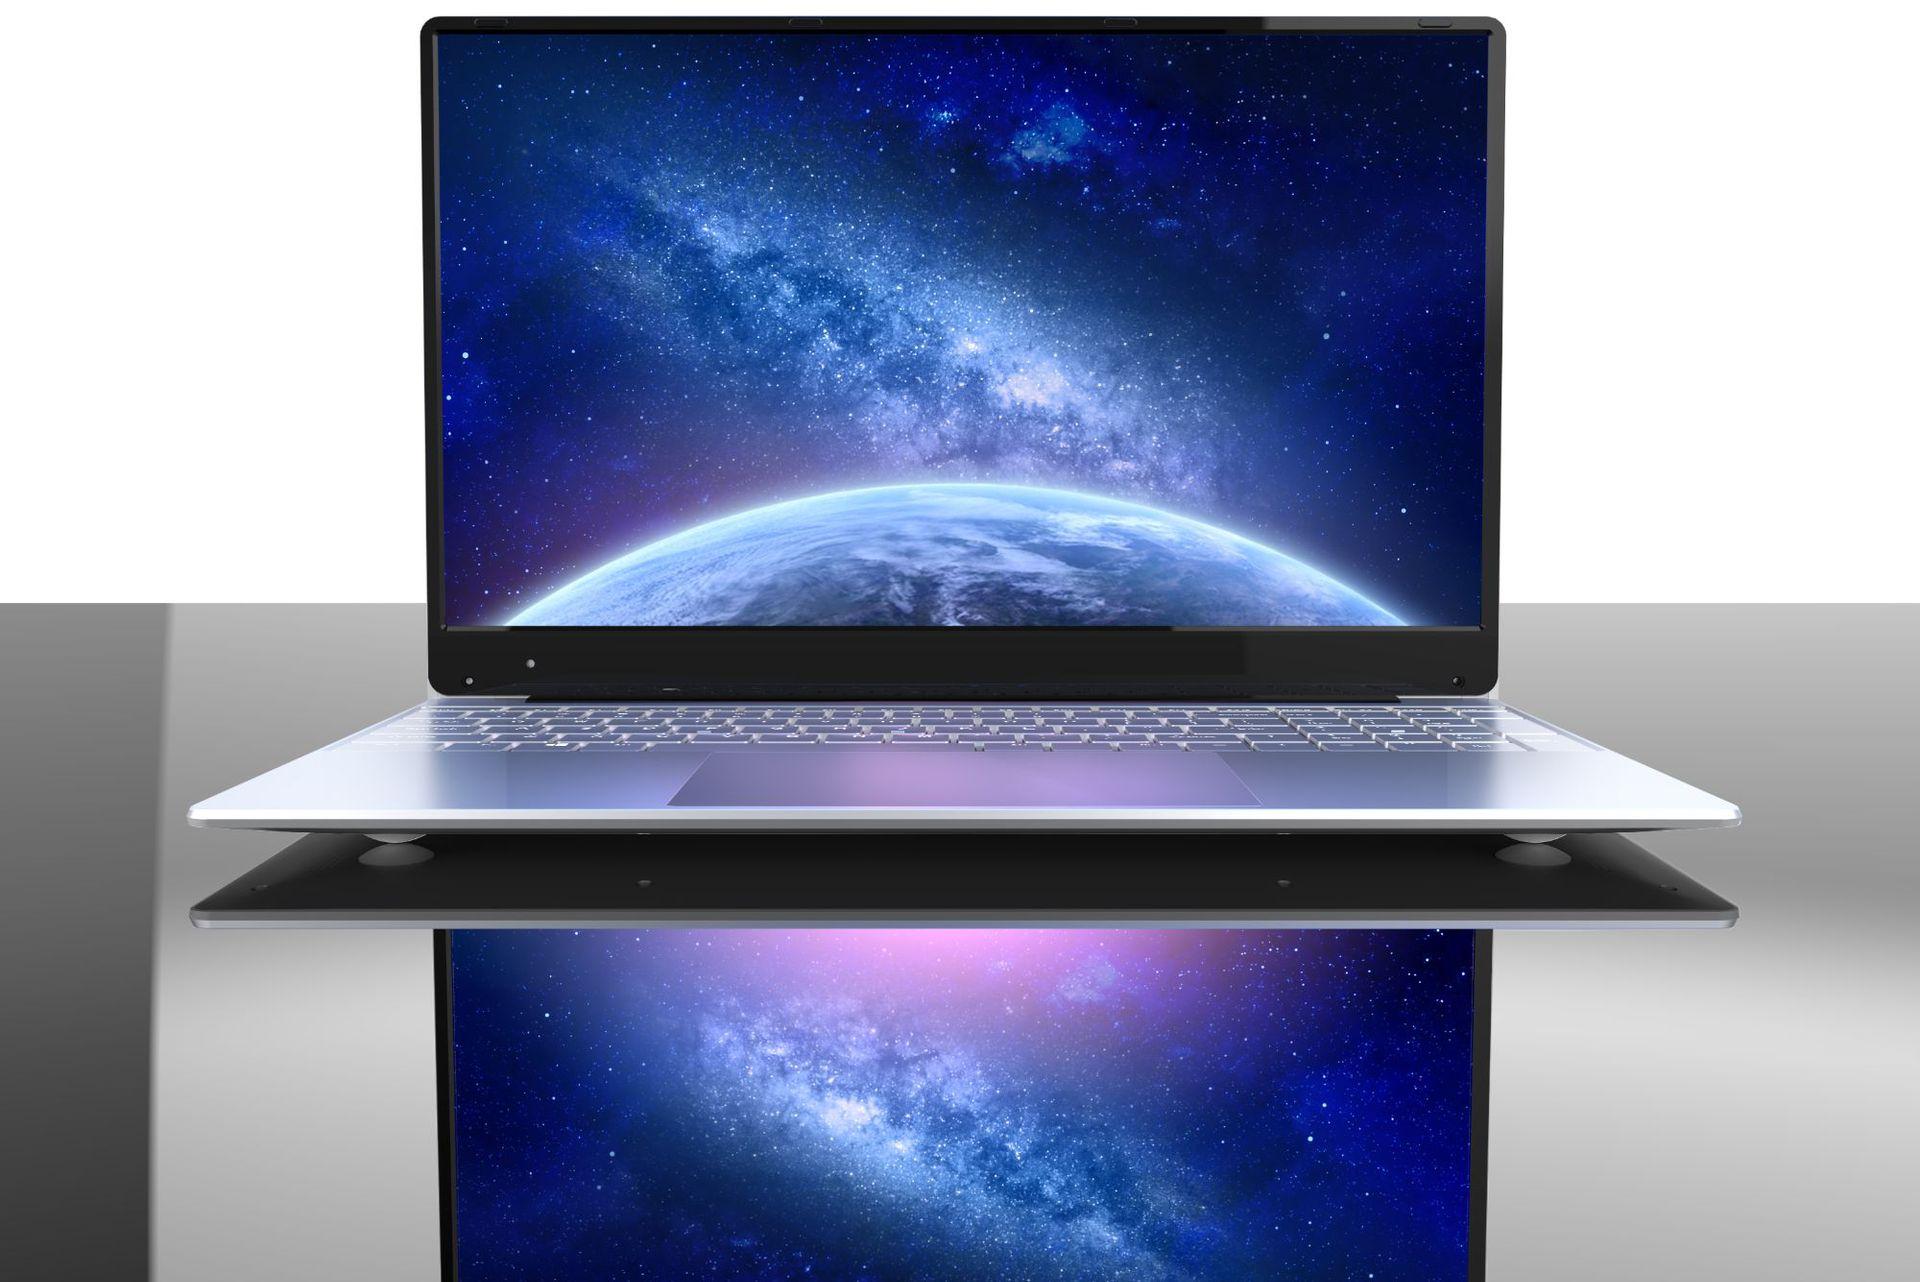 New Cheap Laptop Computer 15.6 inch Win 10 Laptops computer,ultra-thin J3455